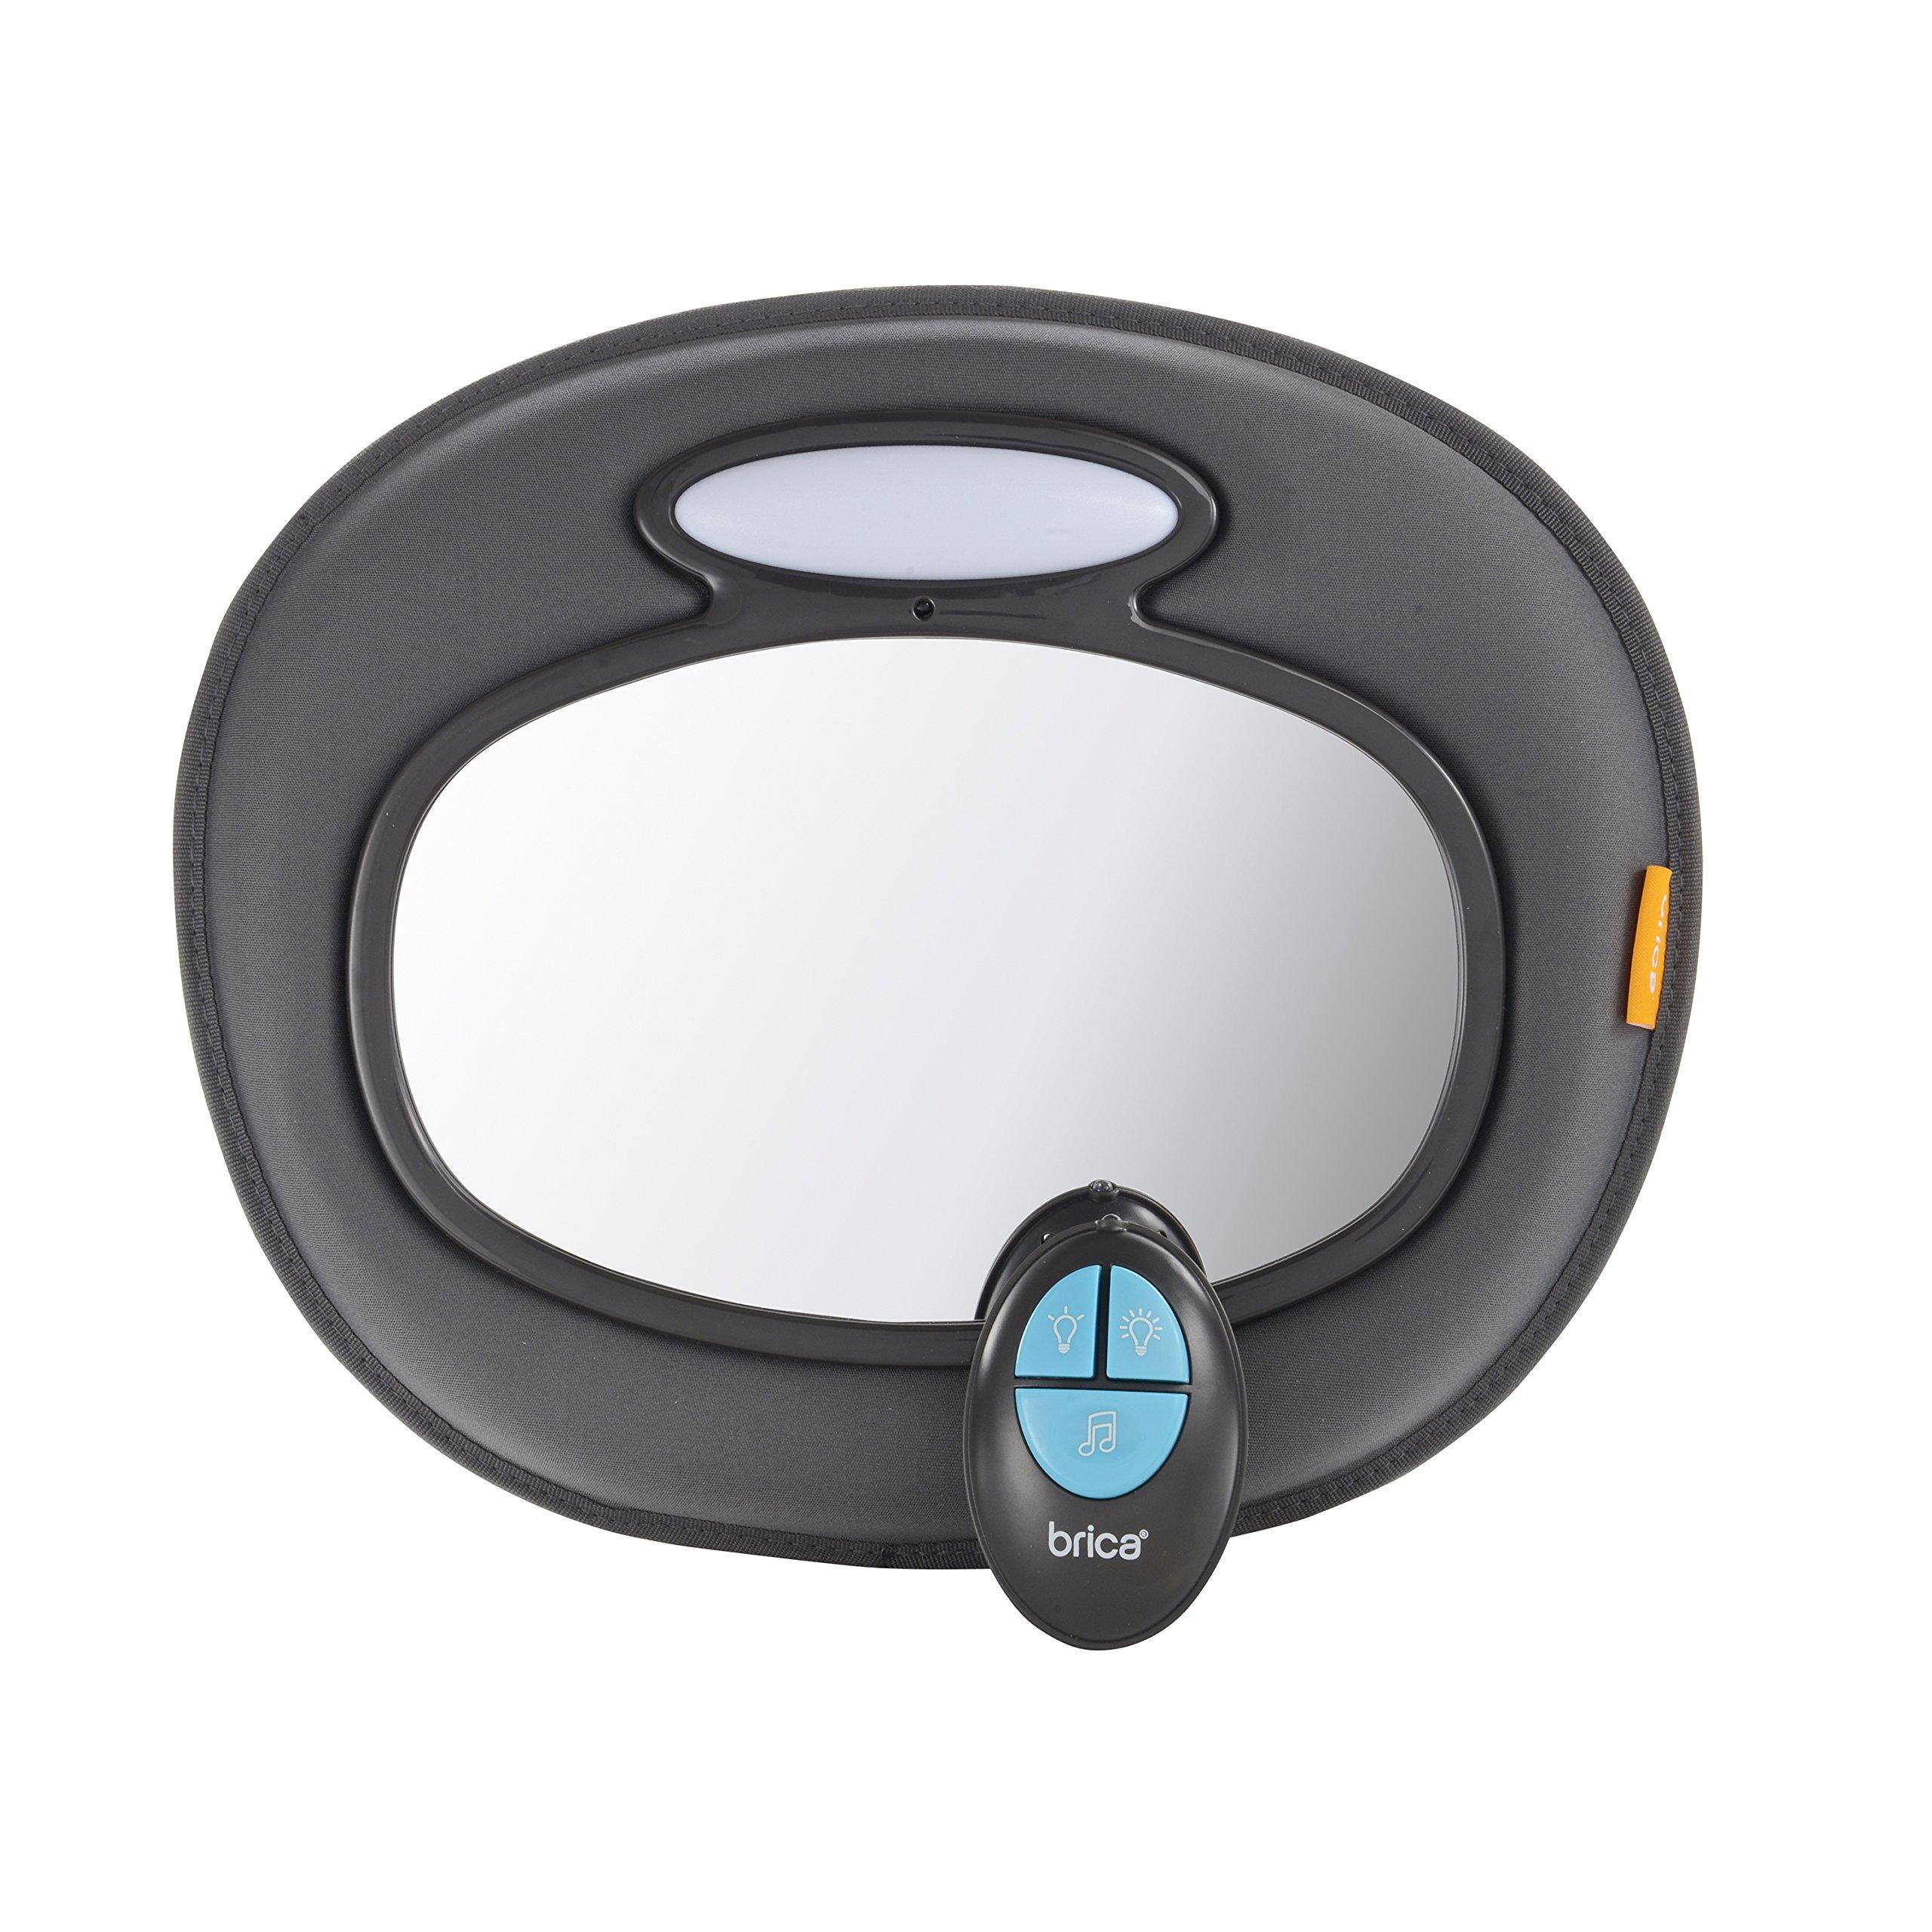 Brica Night Light Musical Baby In-Sight Car Mirror